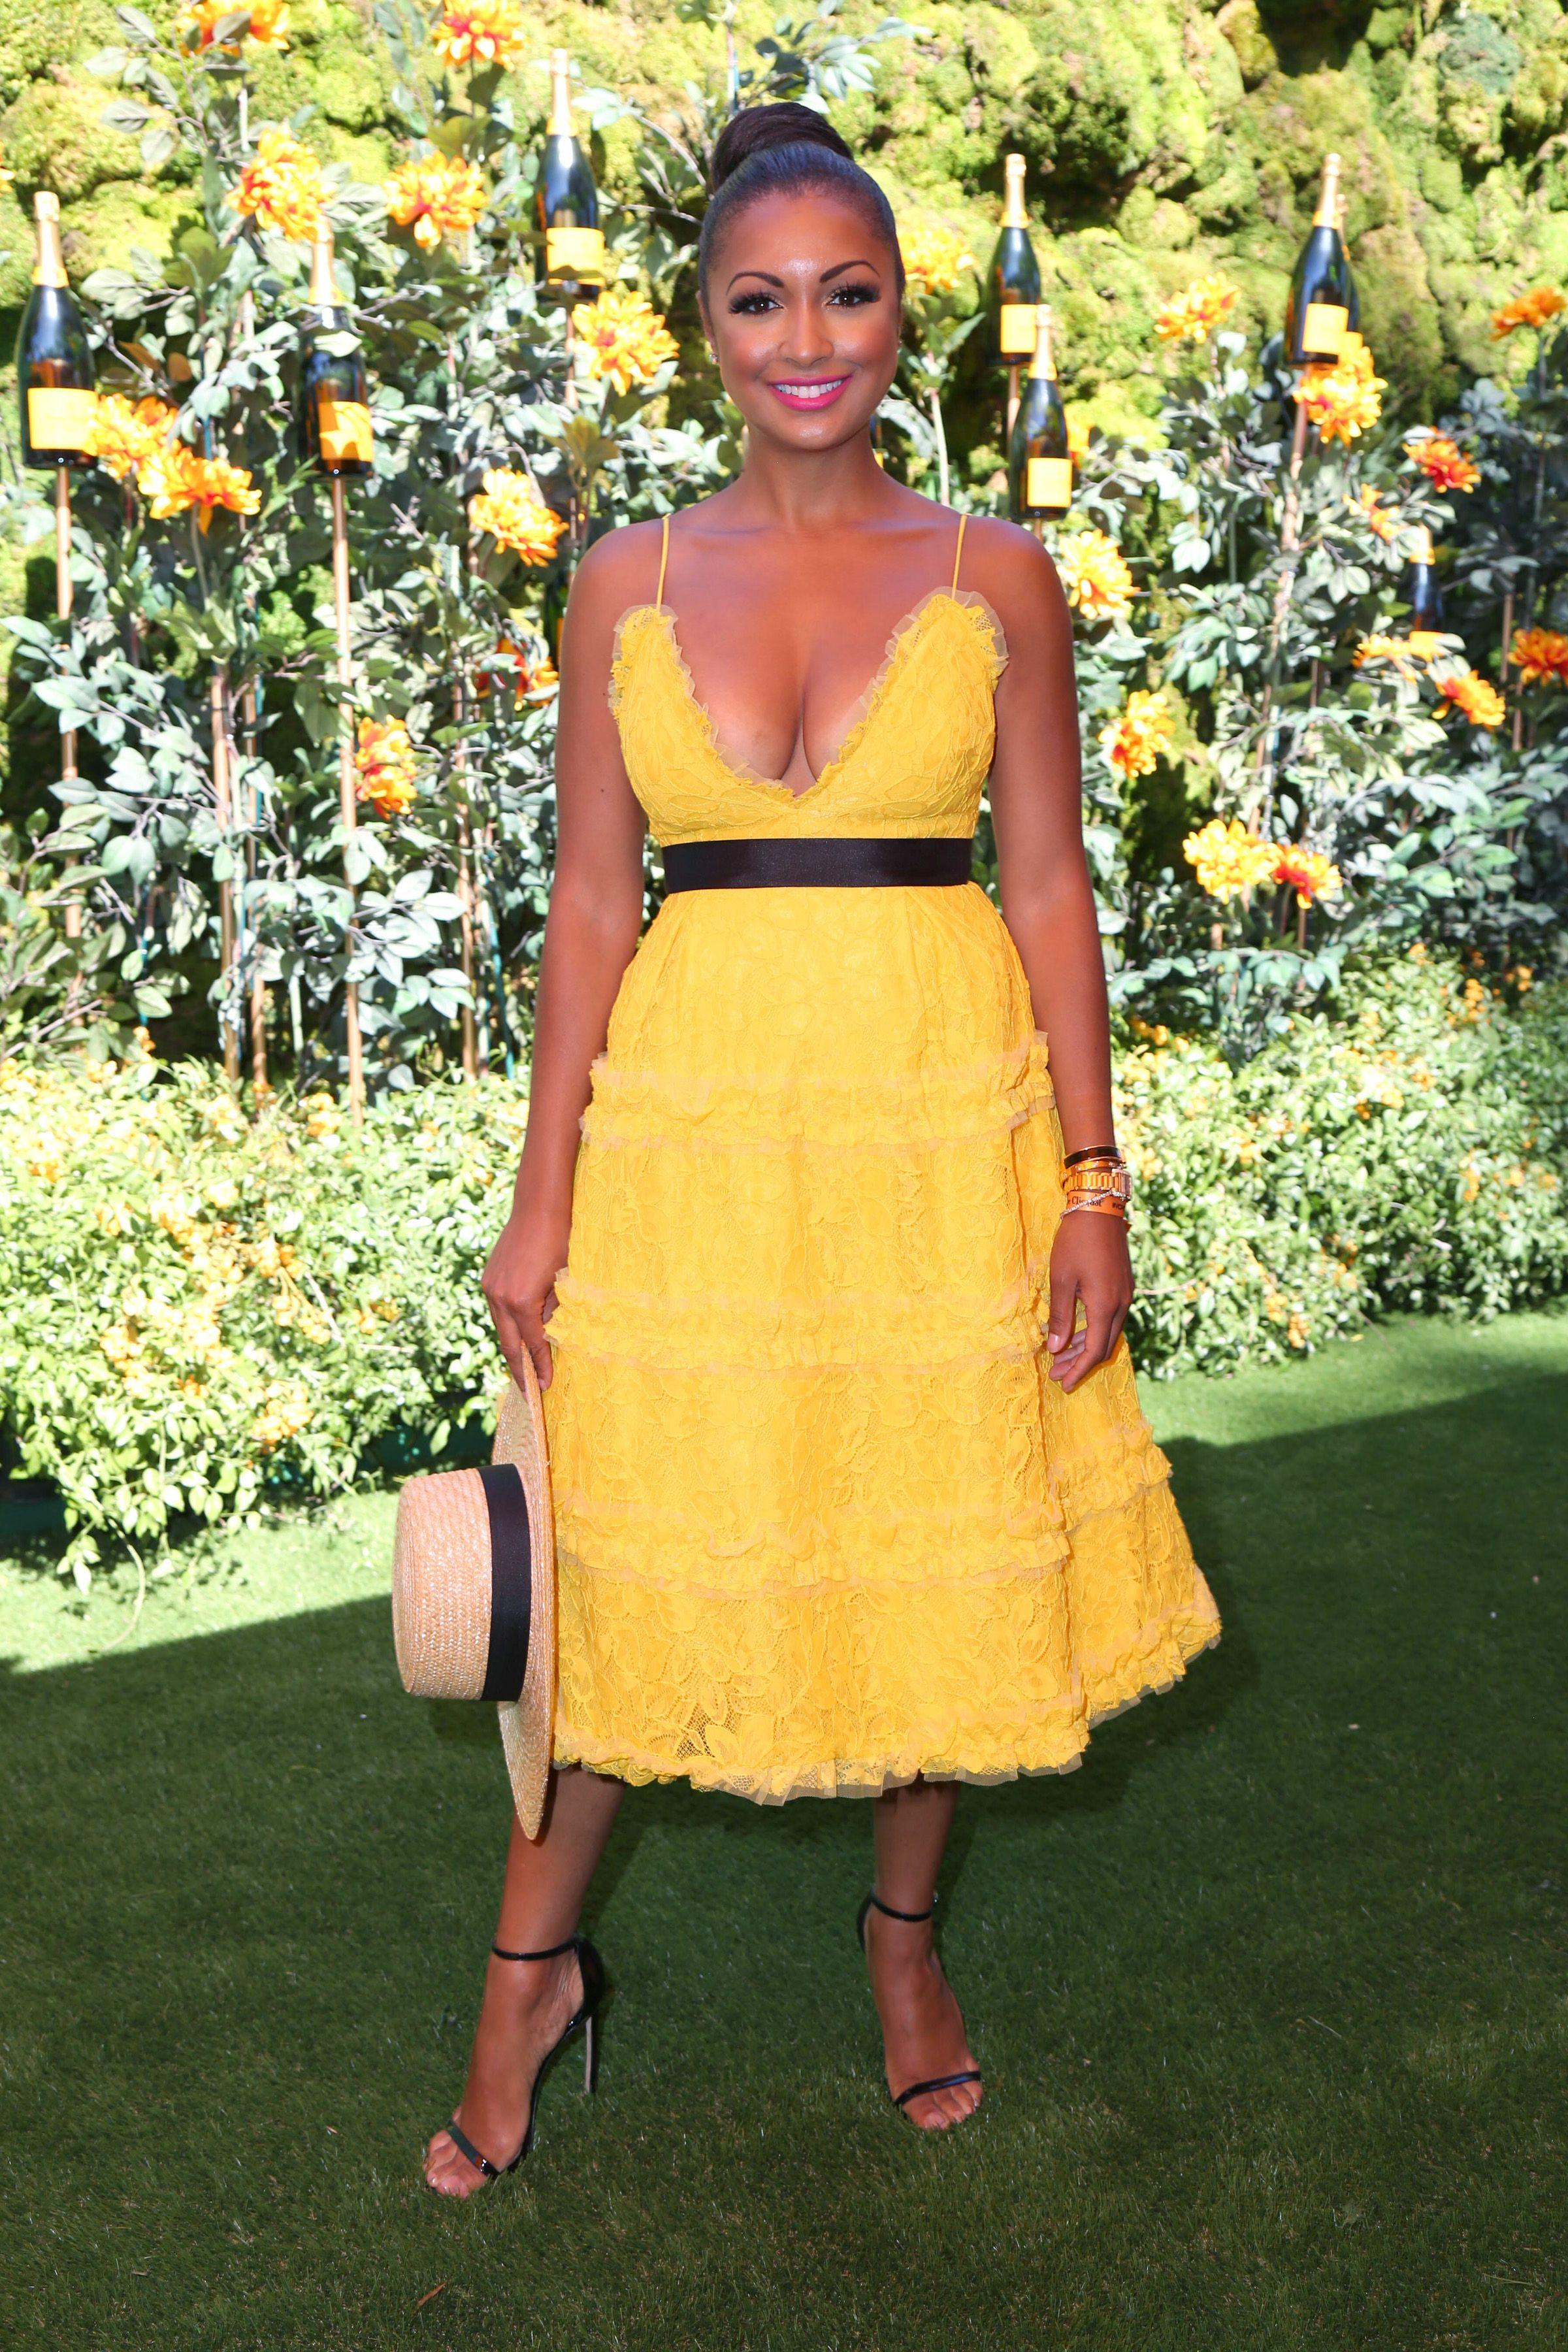 Eboni K. Williams wears a yellow dress and black belt.